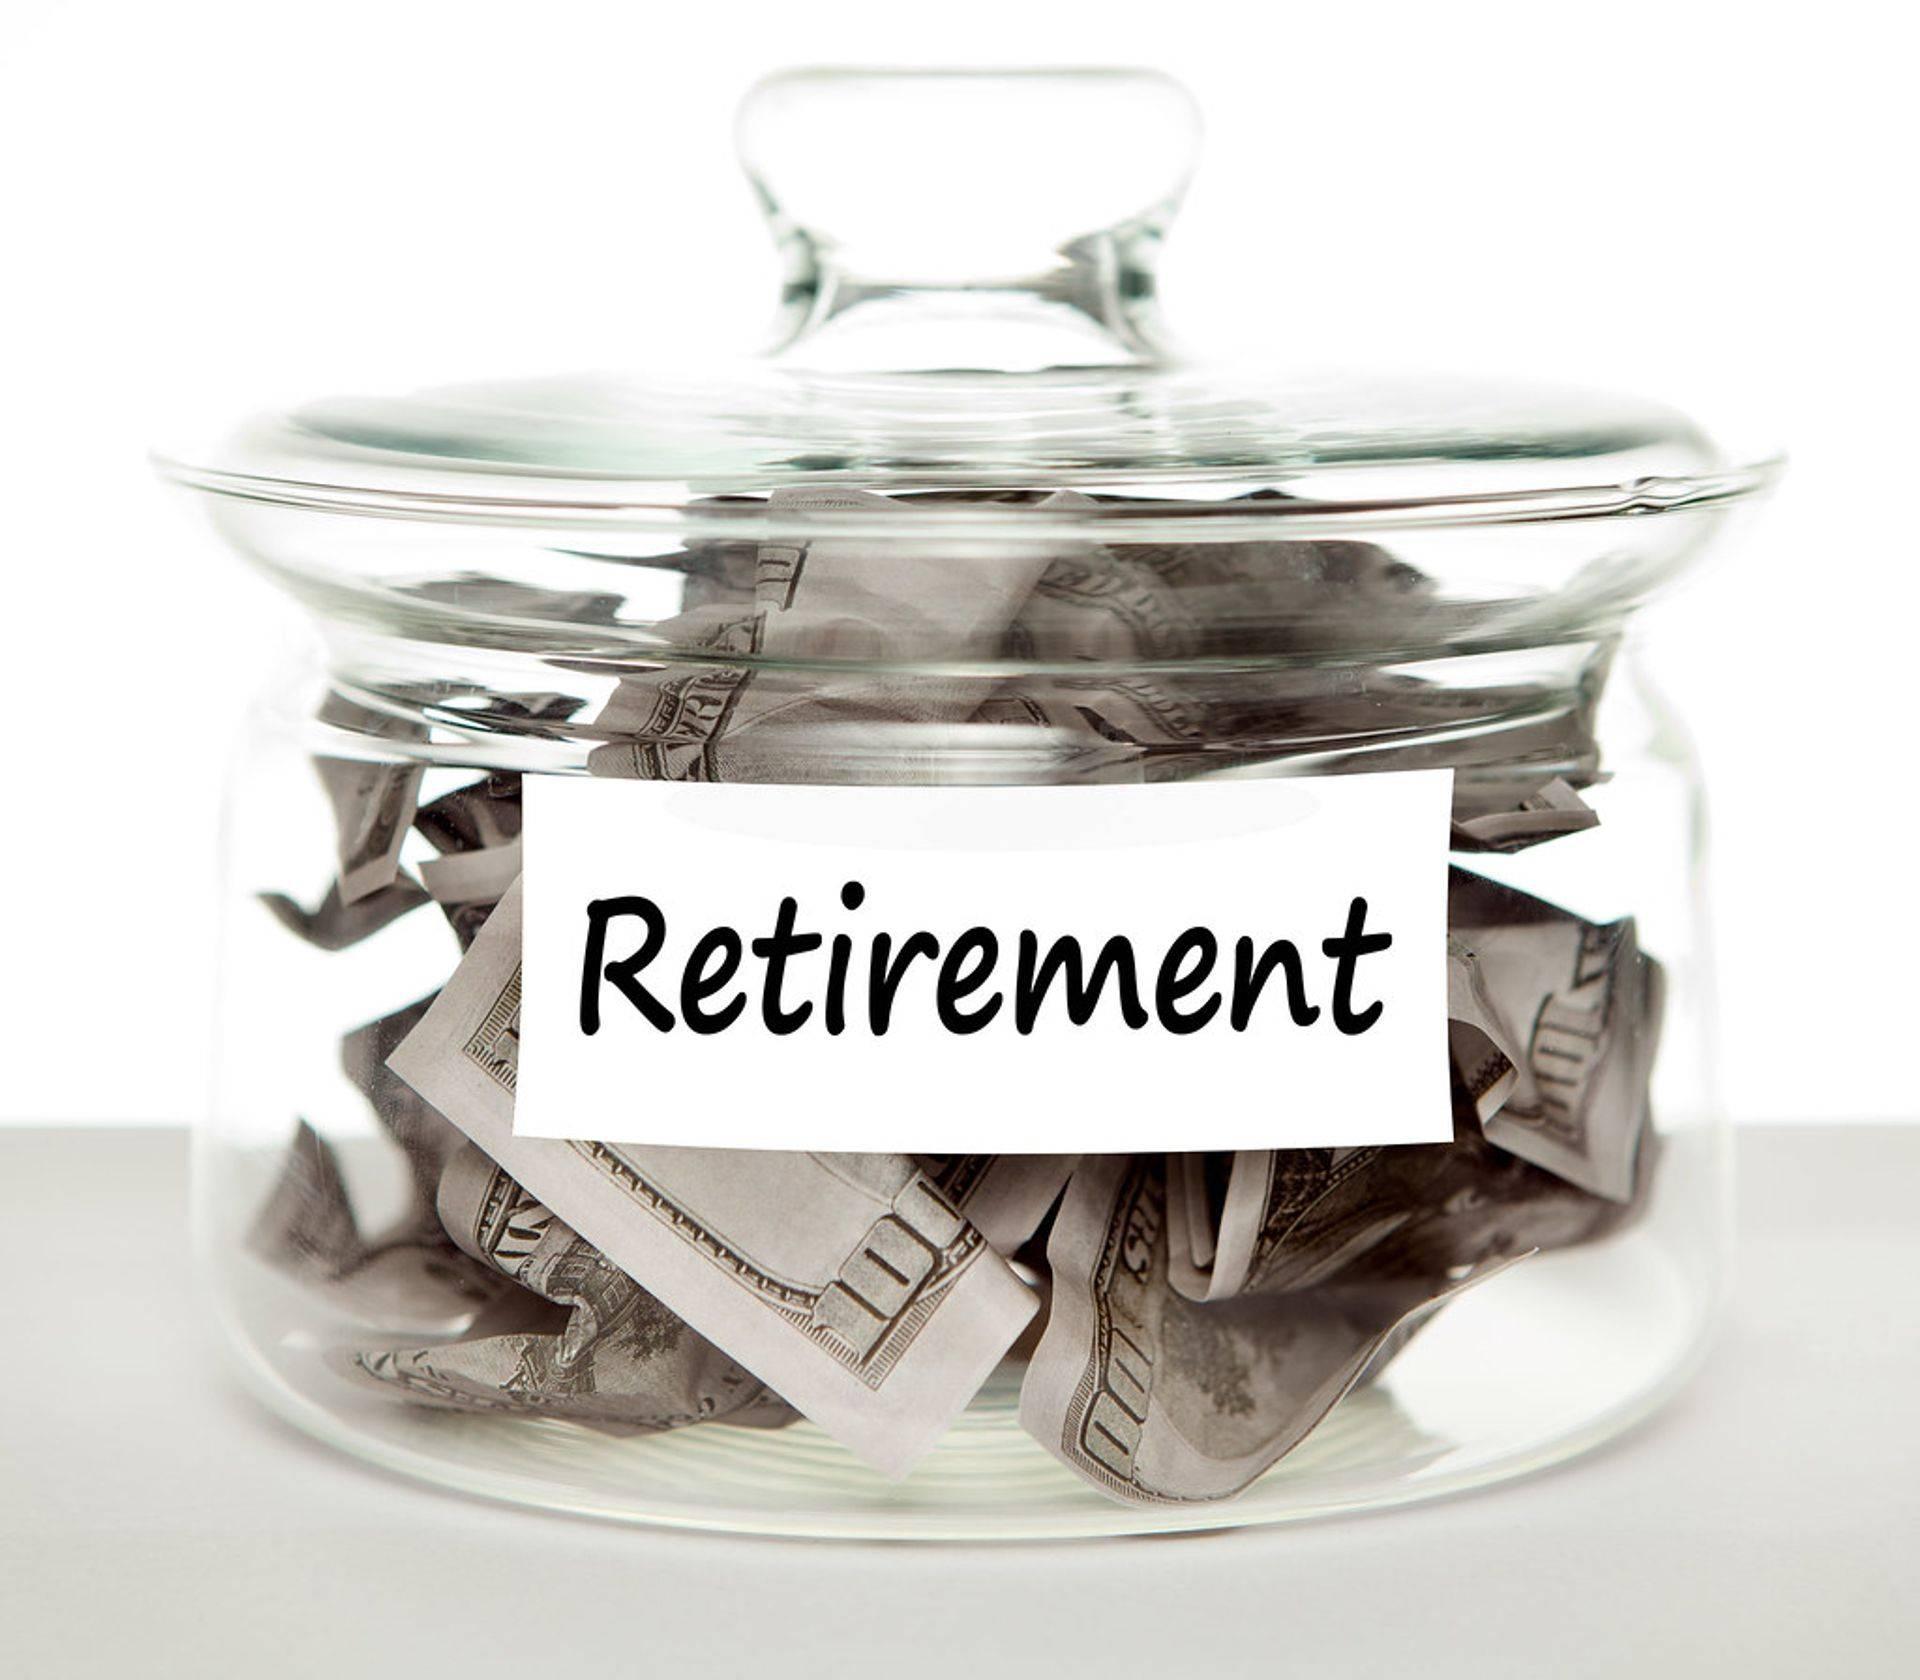 Retirement Planning, Saving